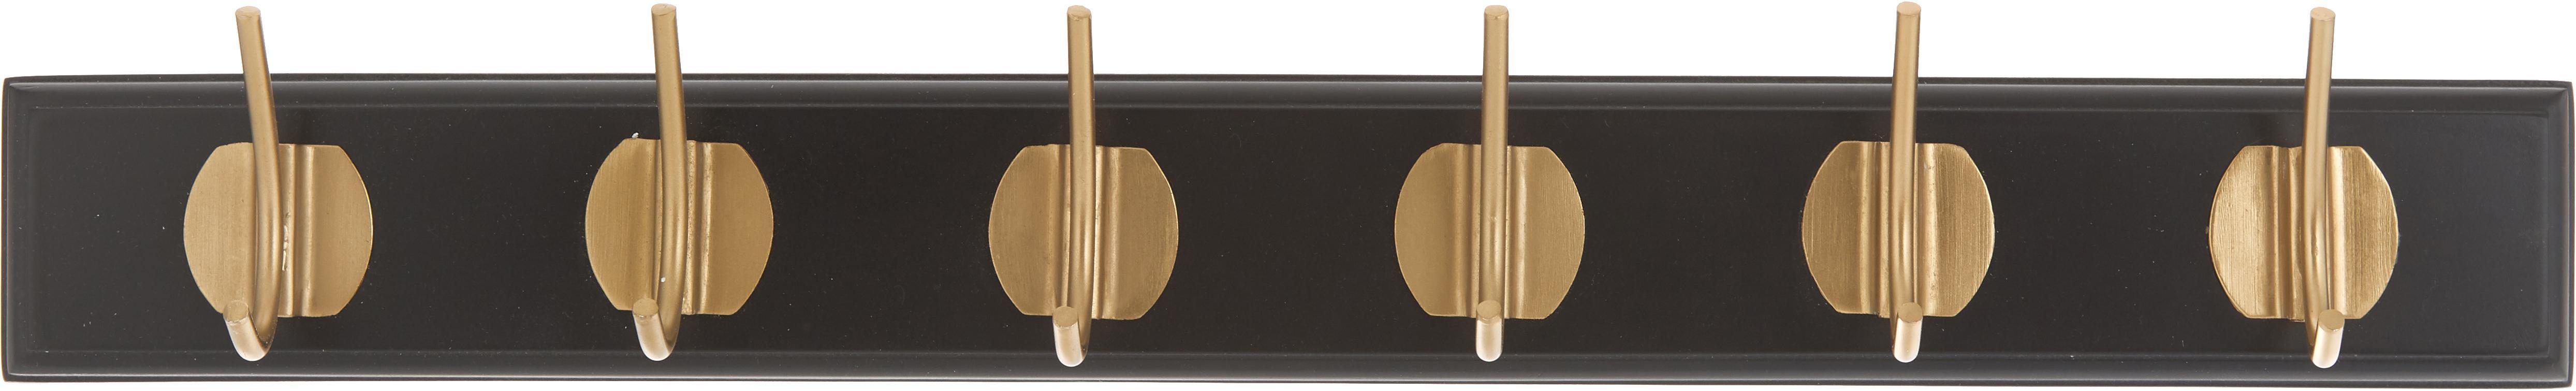 Kapstok Aoife met metalen haak, Lijst: gelakt MDF, Zwart, 60 x 7 cm